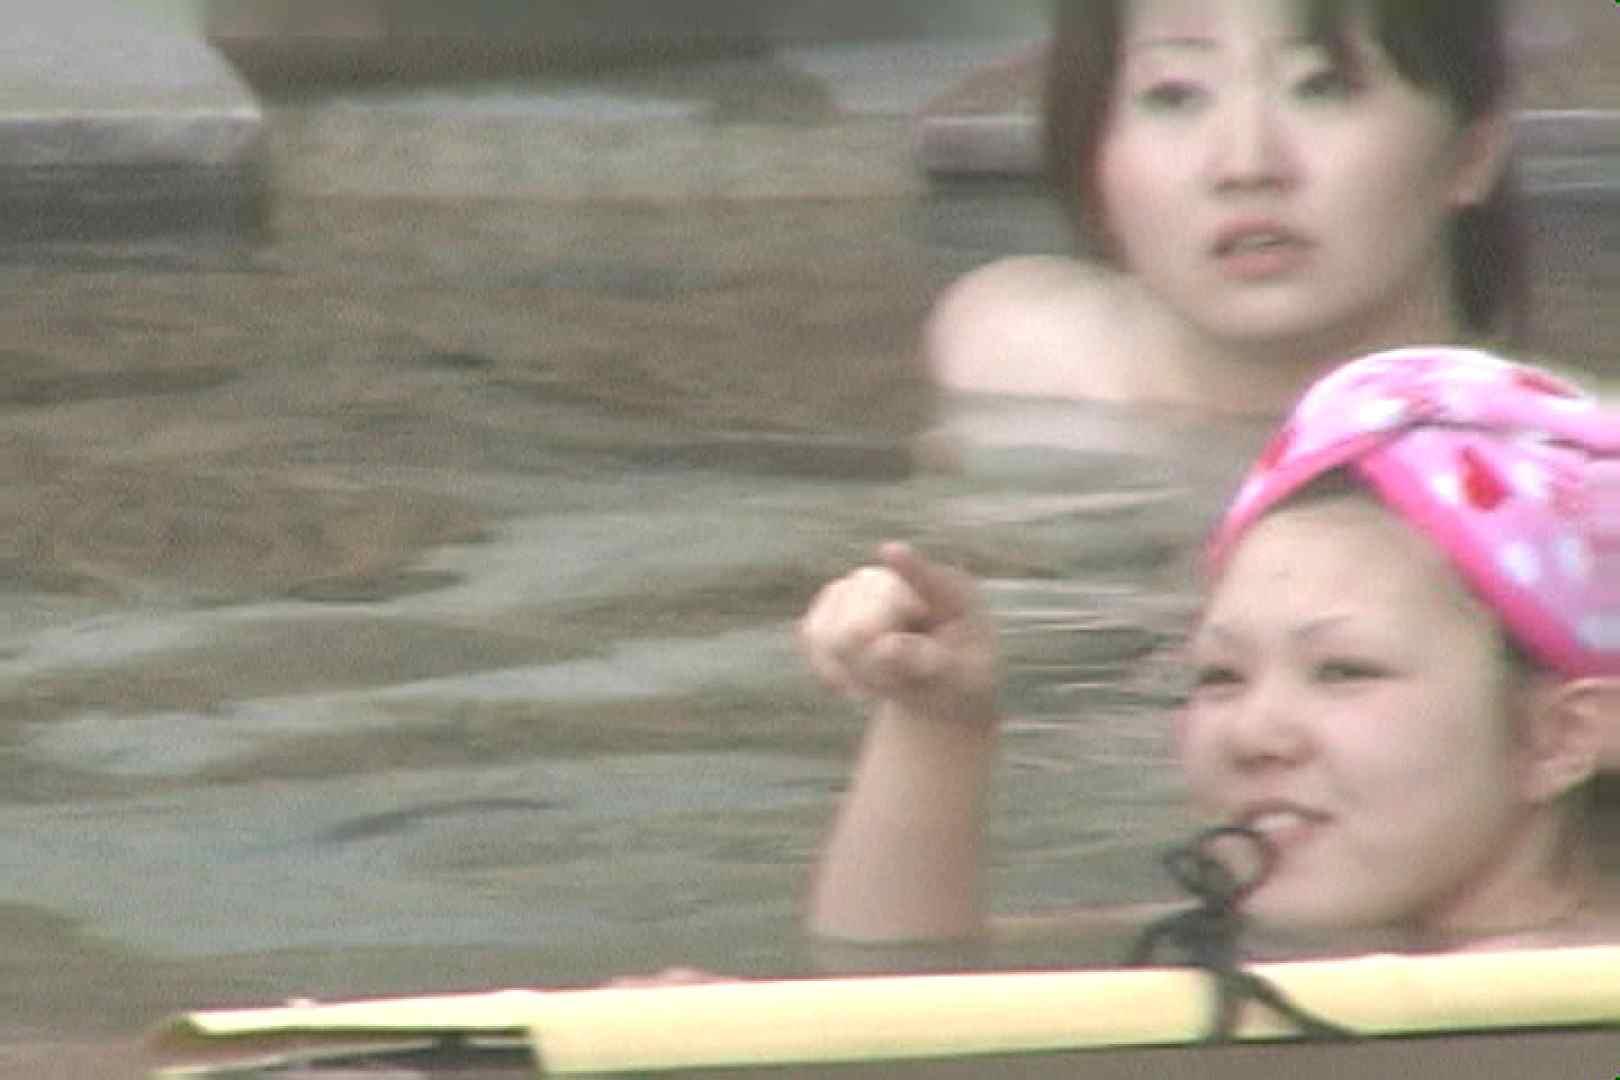 Aquaな露天風呂Vol.25 露天風呂編 | 盗撮シリーズ  91PIX 29